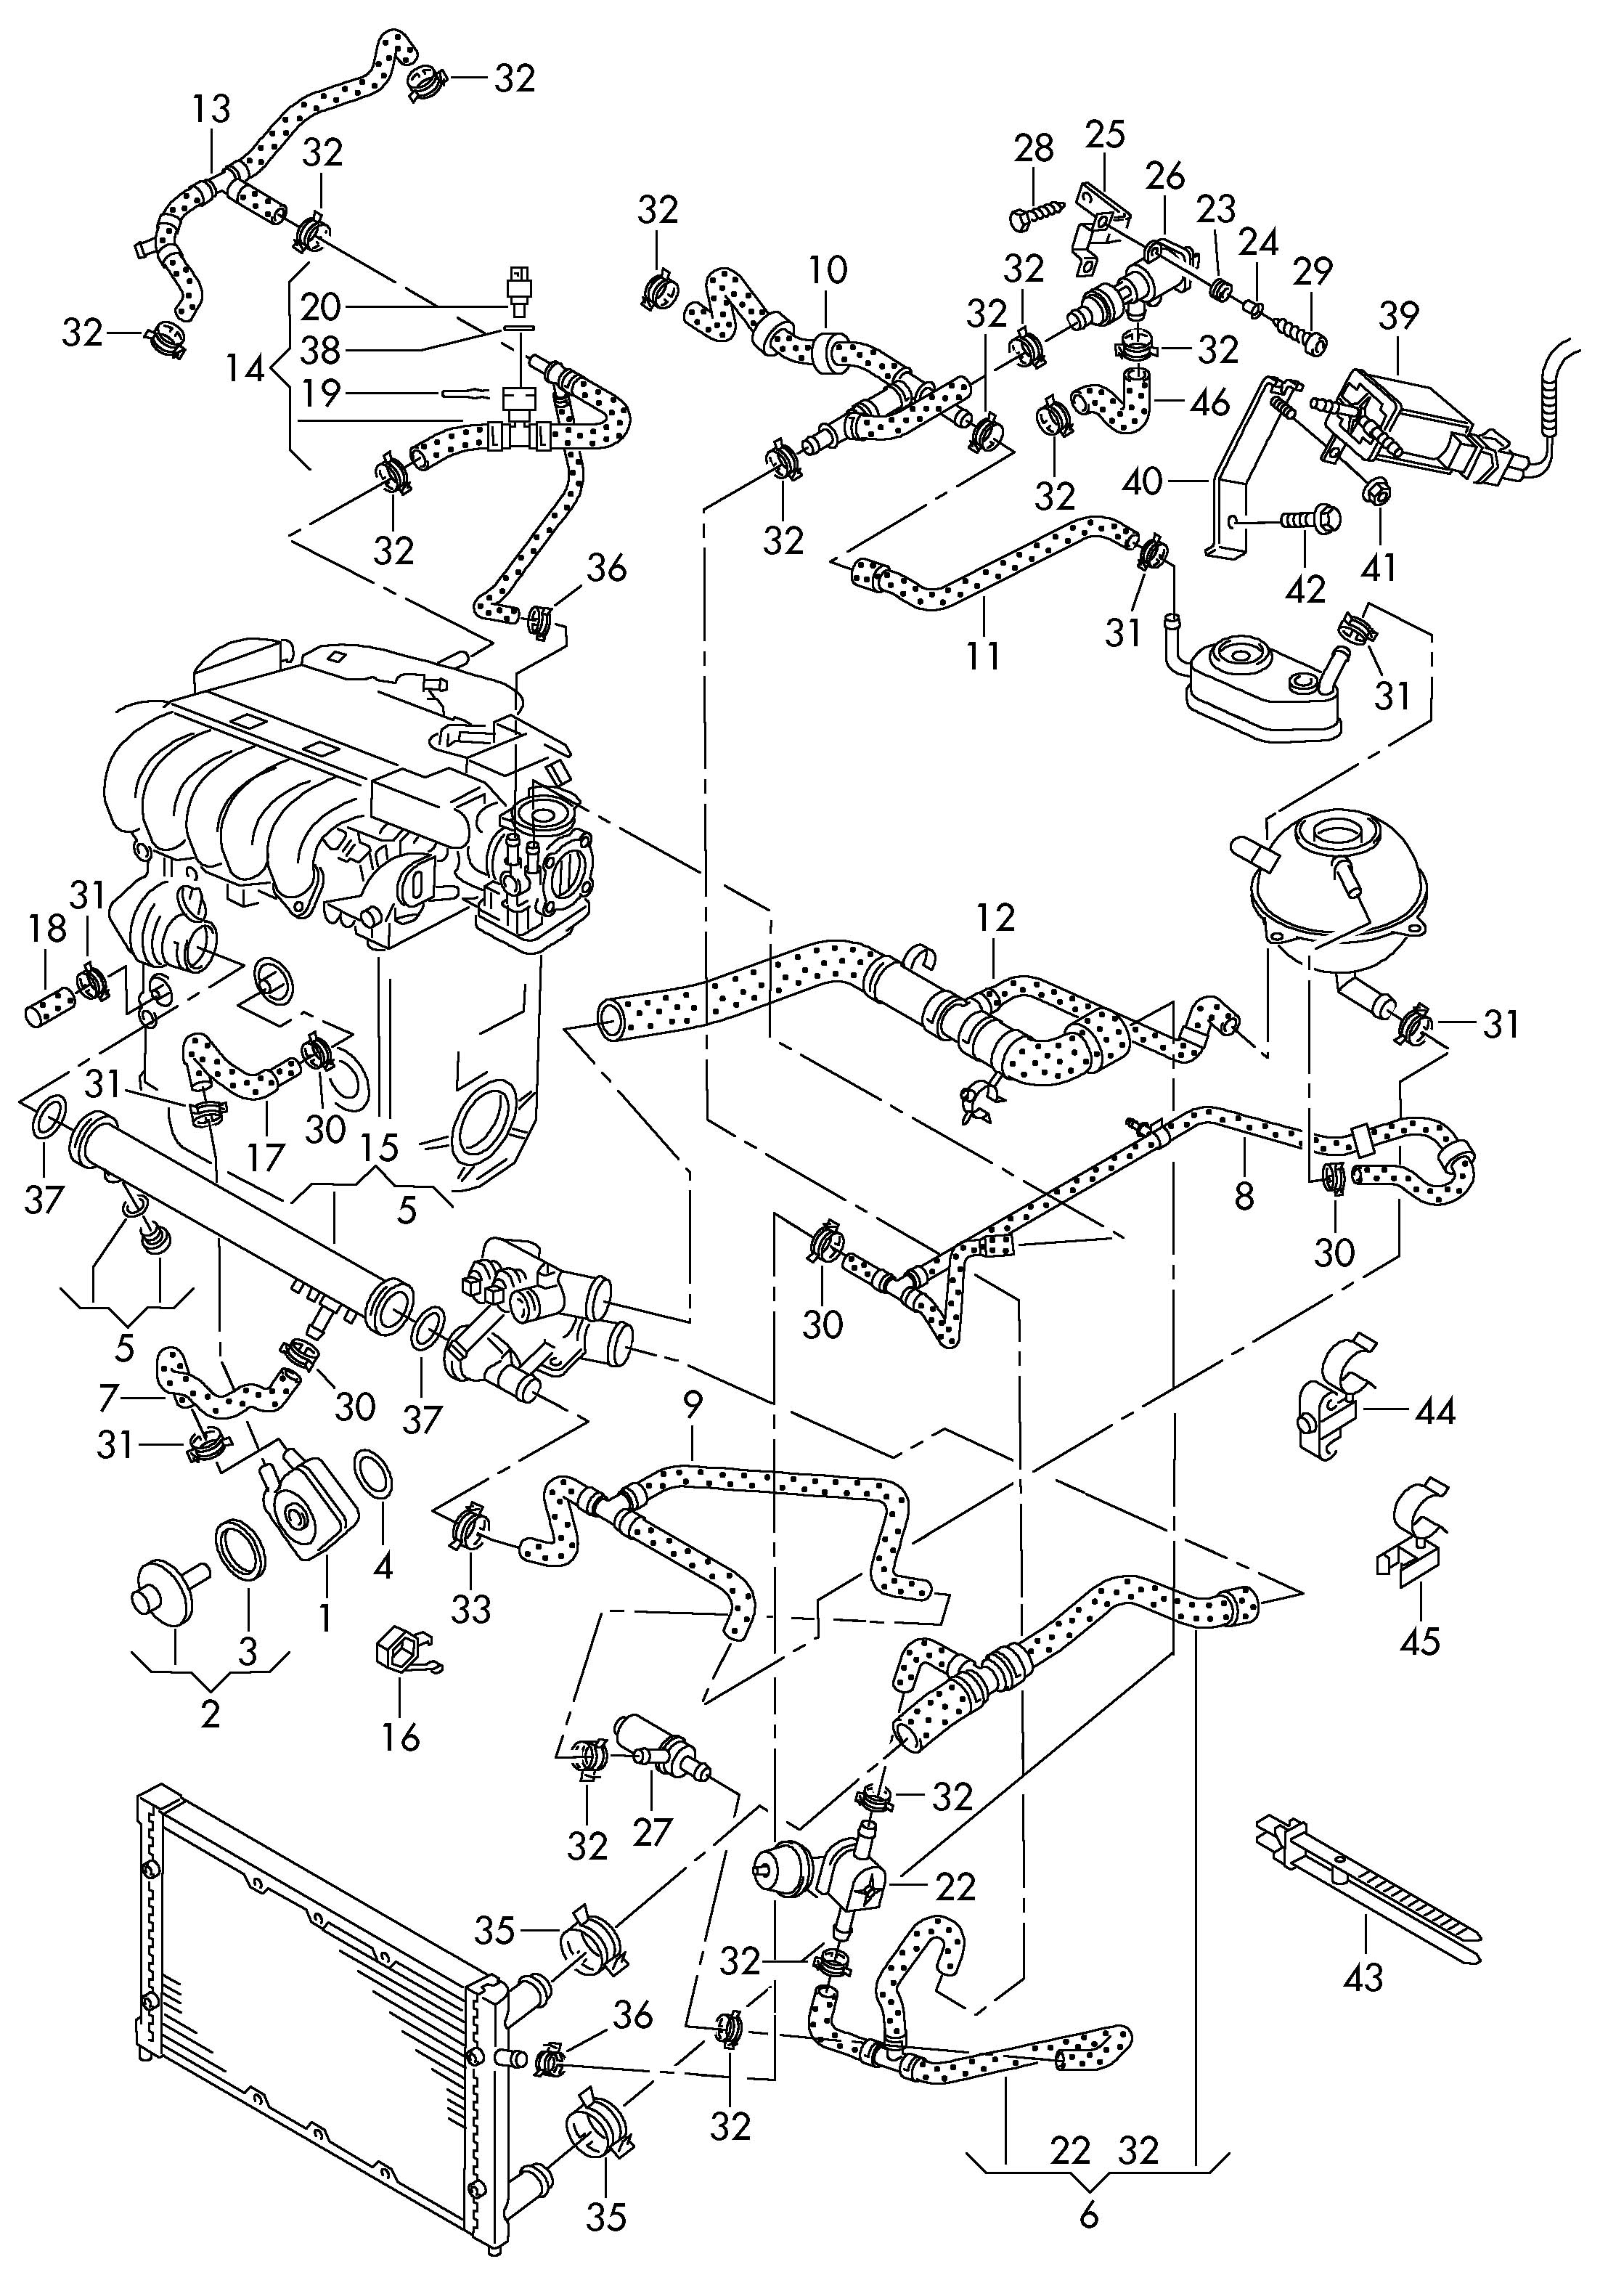 Vw golf mk4 parts diagram periodic tables